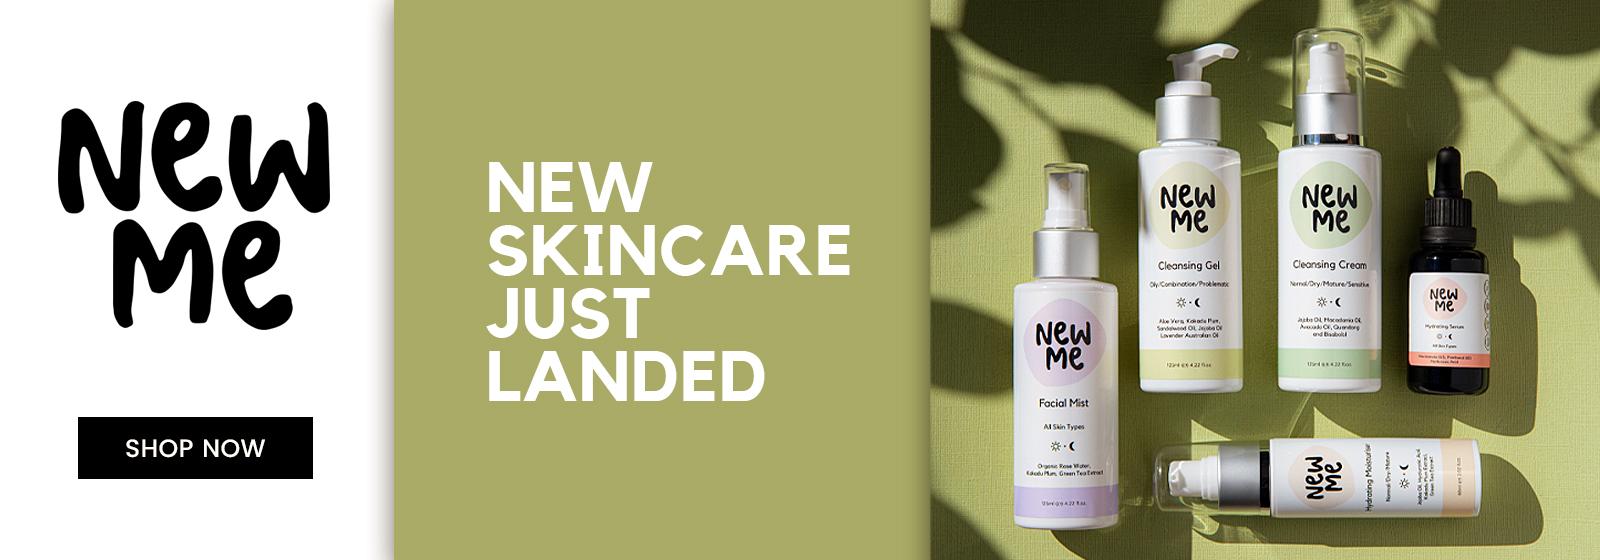 New-me-skincare